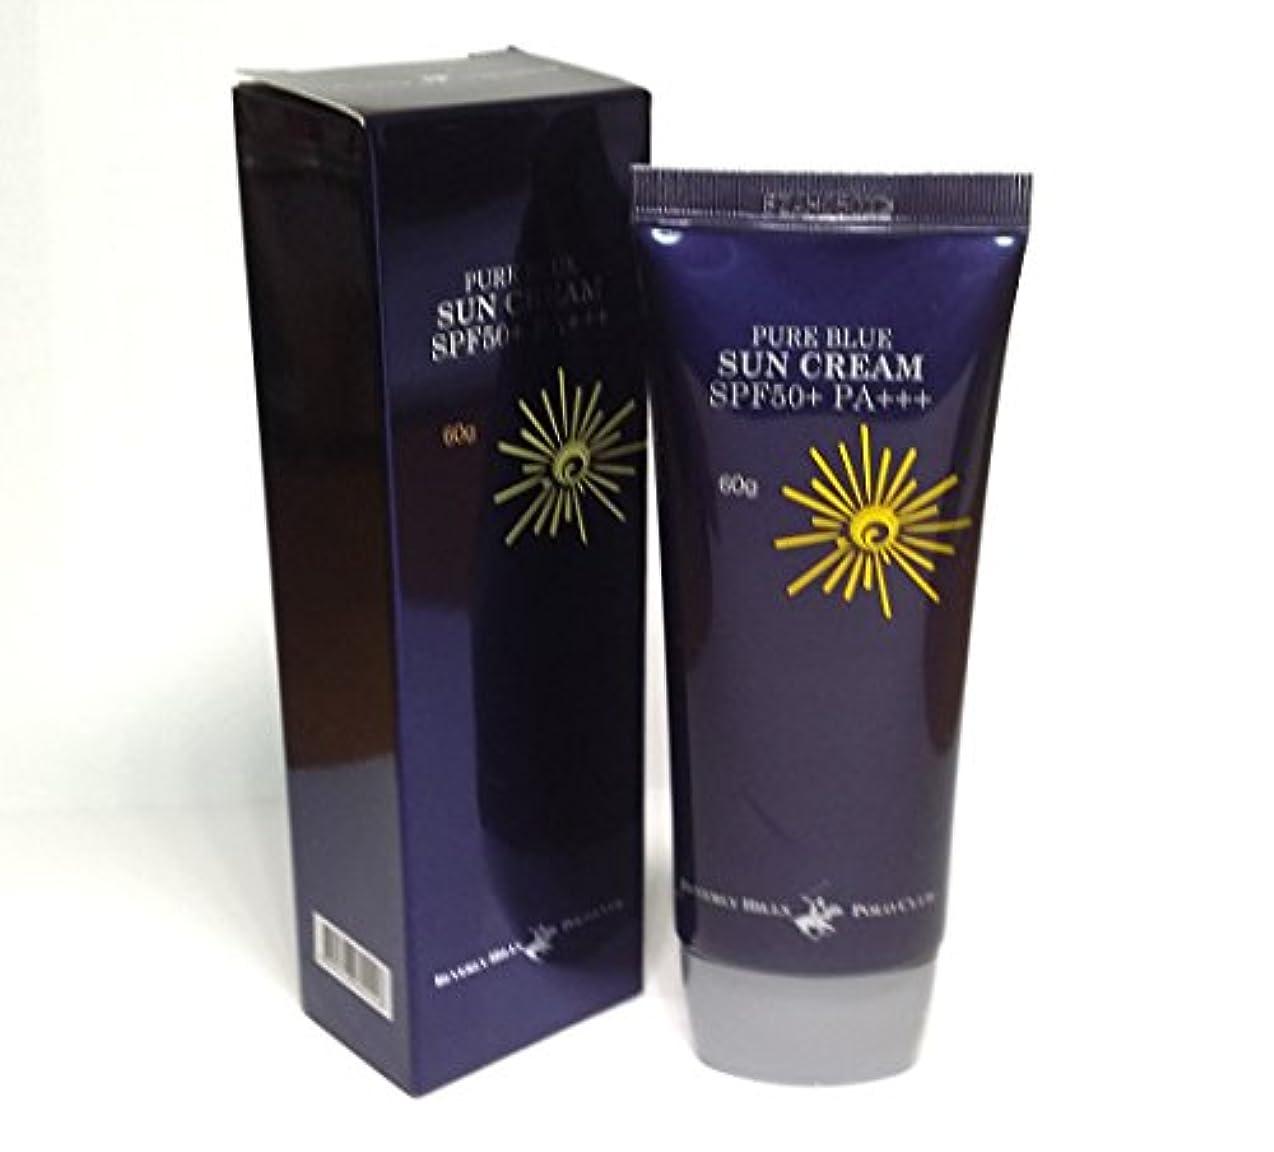 [BEVERLY HILLS POLO CLUB] ピュアブルーサンクリームSPF50 + PA +++ 60g X 1ea / 韓国化粧品 / Pure Blue Sun Cream SPF50+ PA+++ 60g...